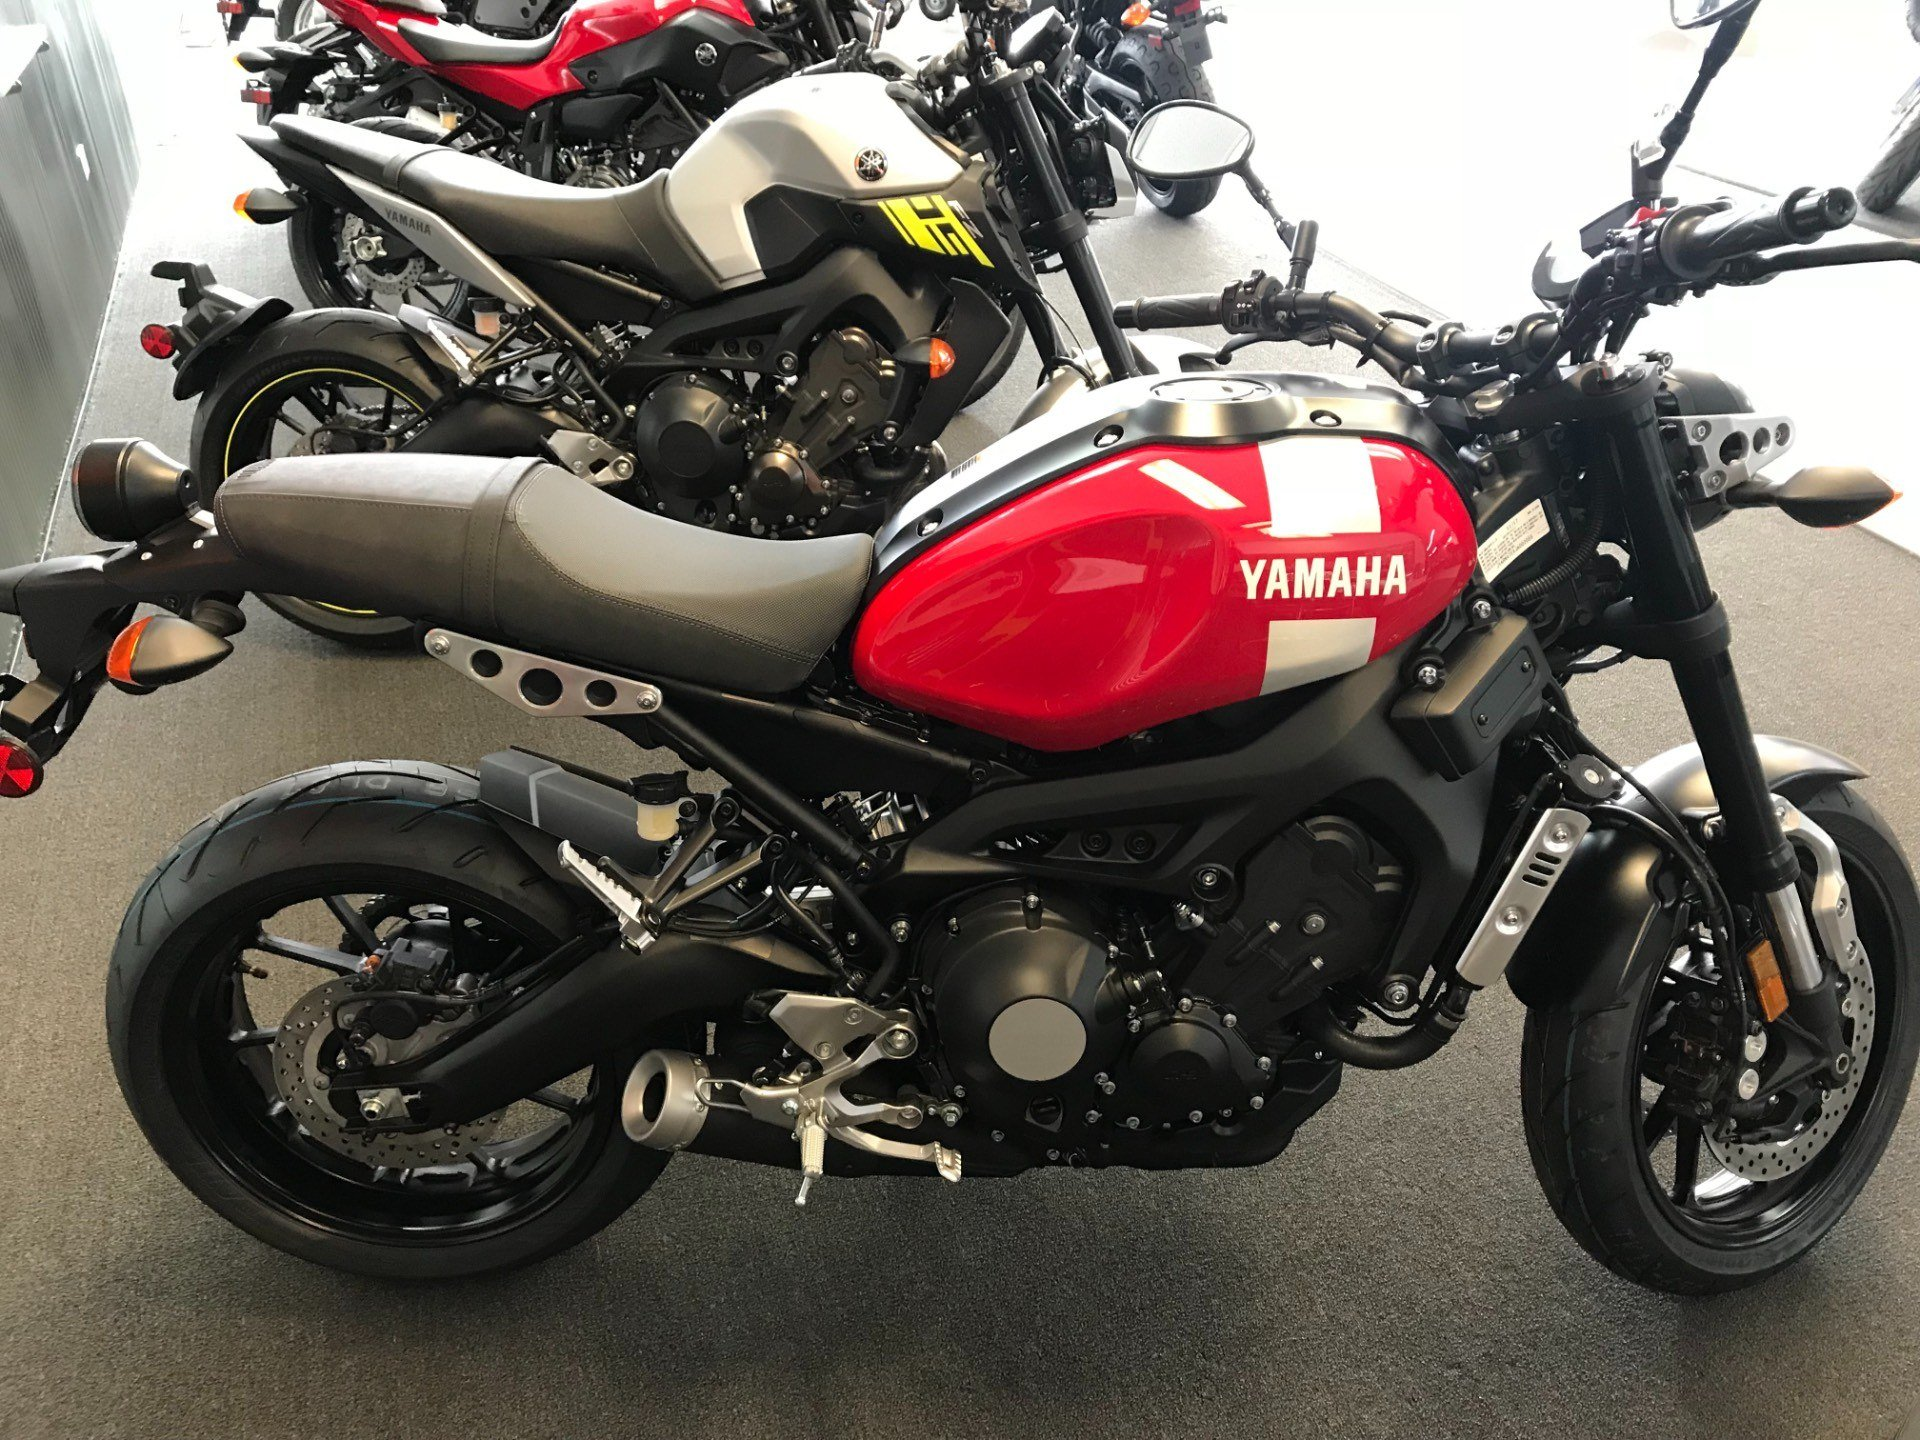 2018 Yamaha XSR900 for sale 107378